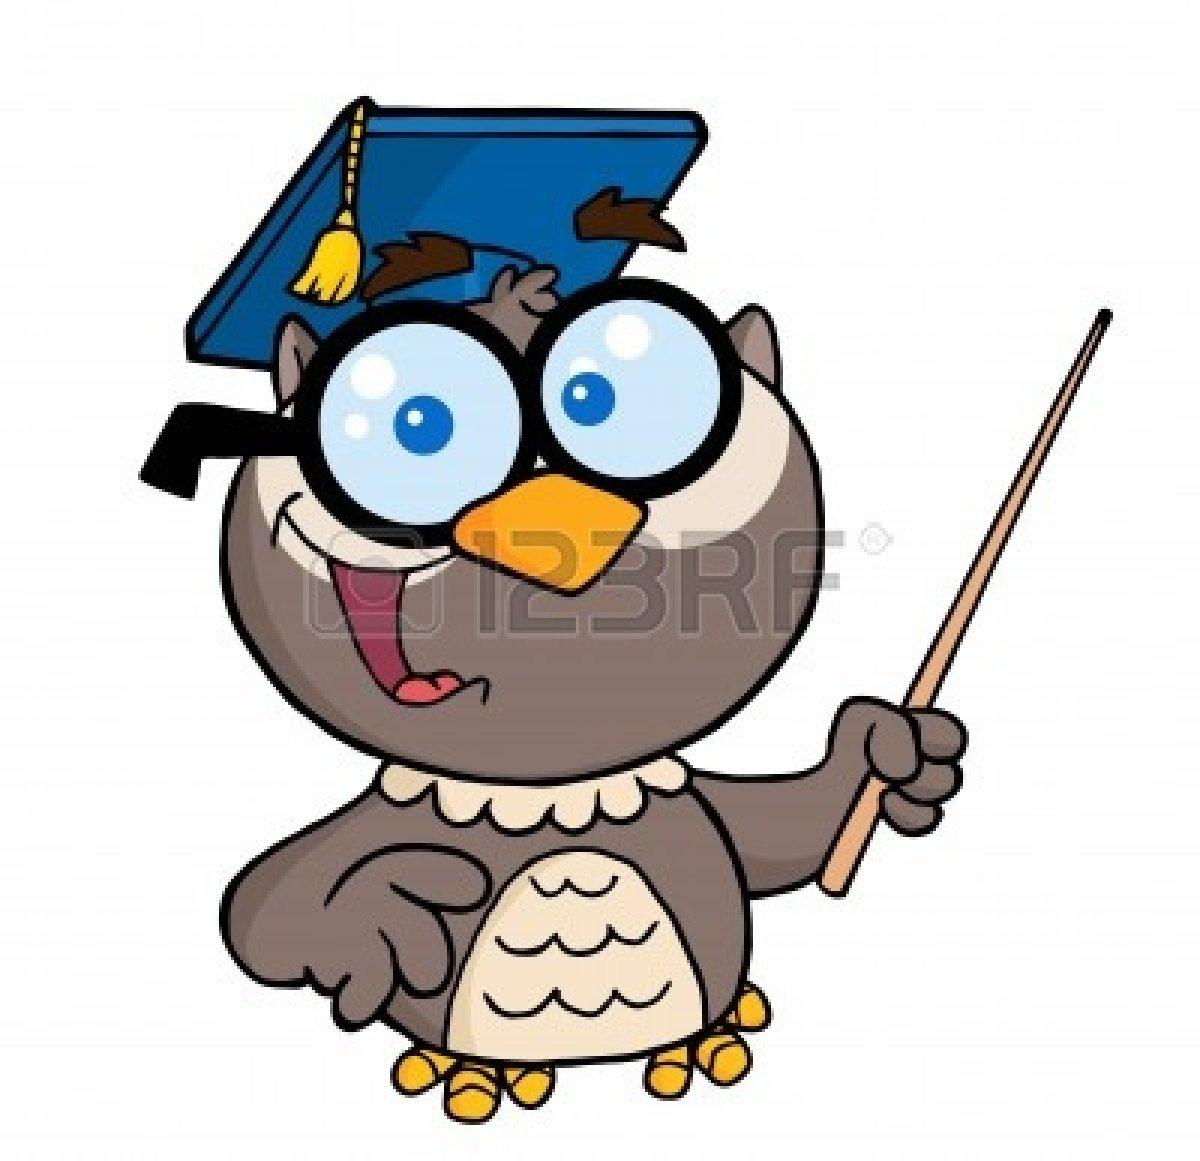 Kindergarten Graduation Owl Clip Art | Clipart Panda ...